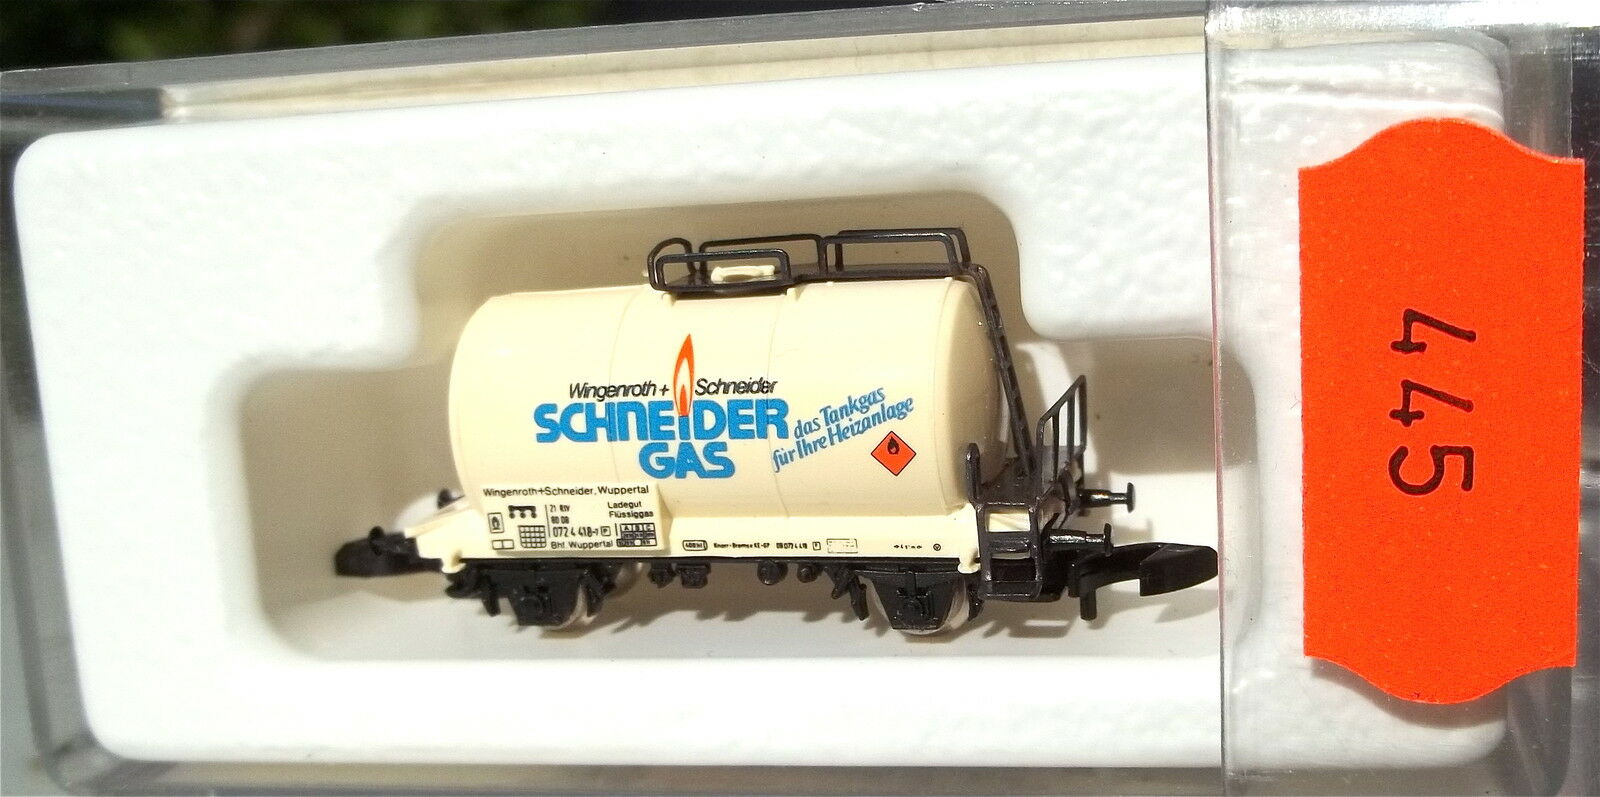 Coupe Gas, les Wagons-Citernes Col  89707 Märklin 8612 Z 1 220 445 Å